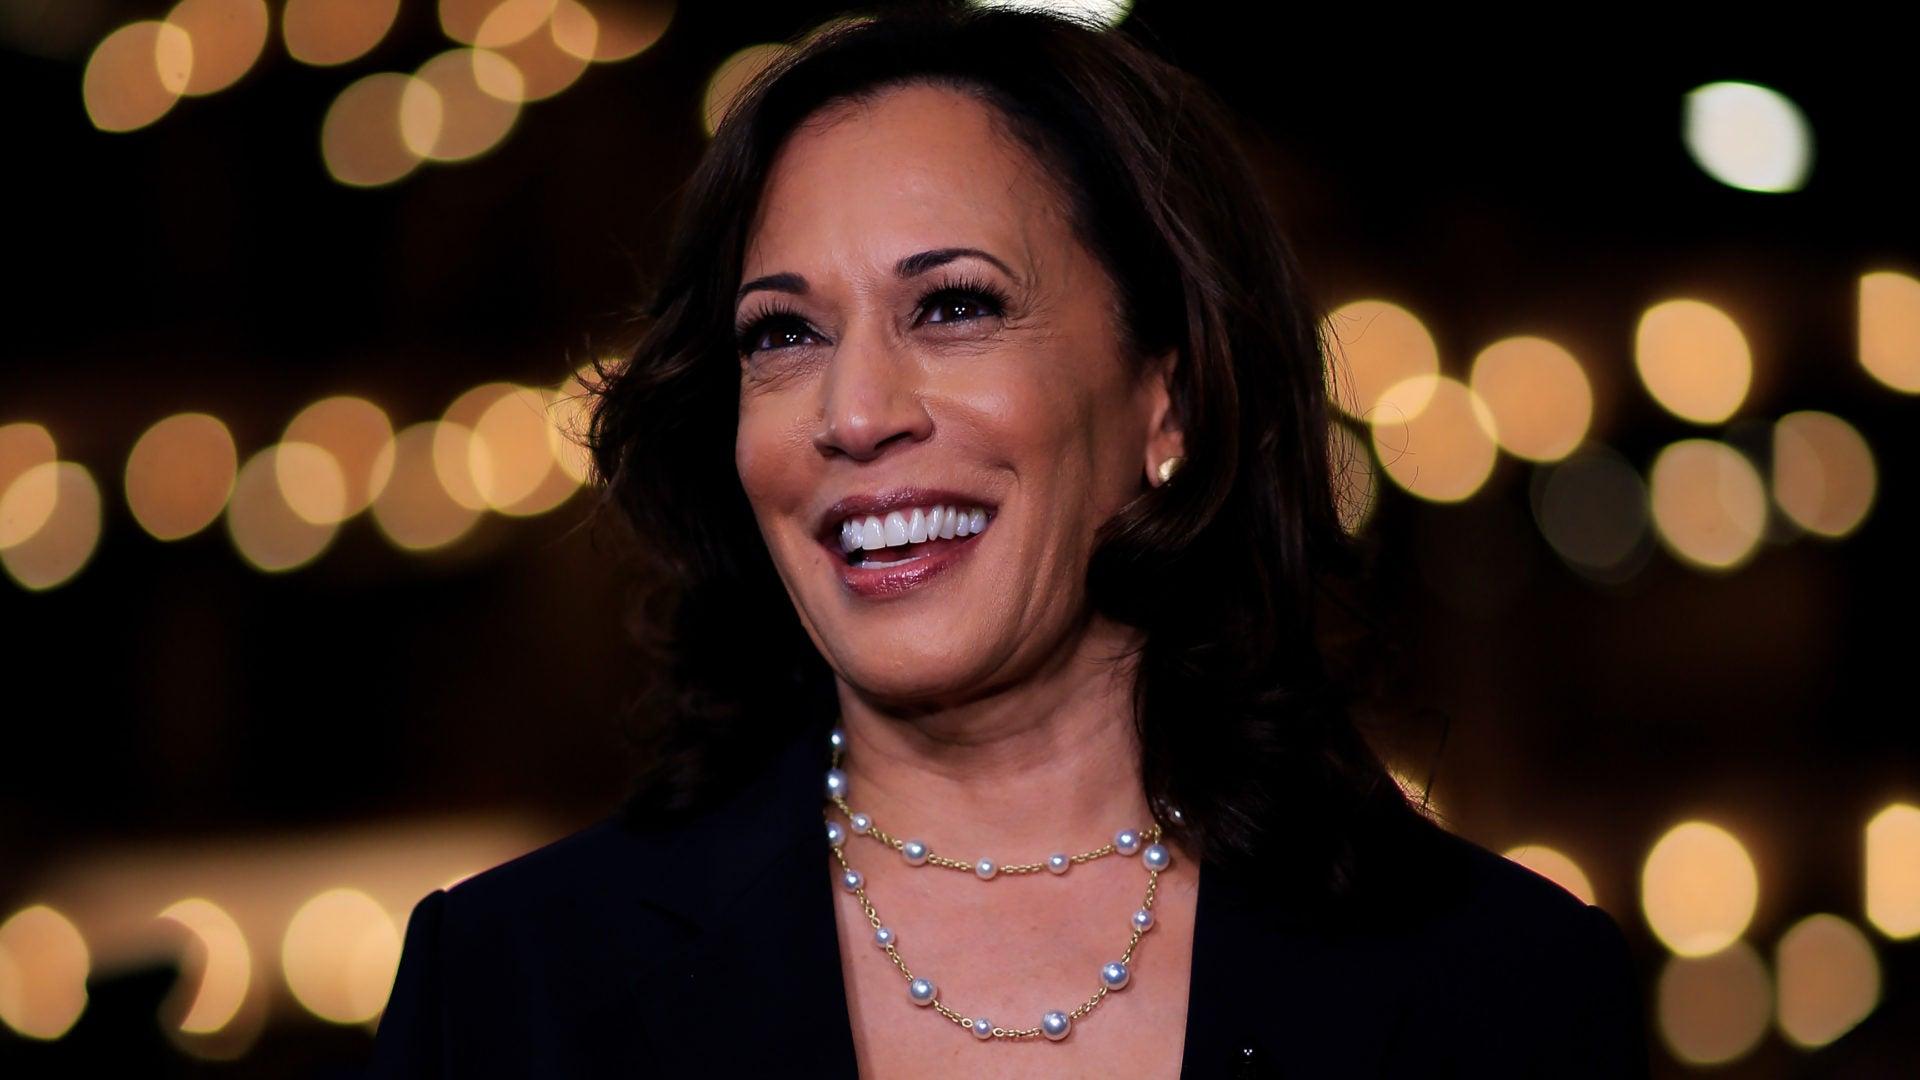 Sen. Kamala Harris Defends Pelosi Amid Tensions With 'The Squad'